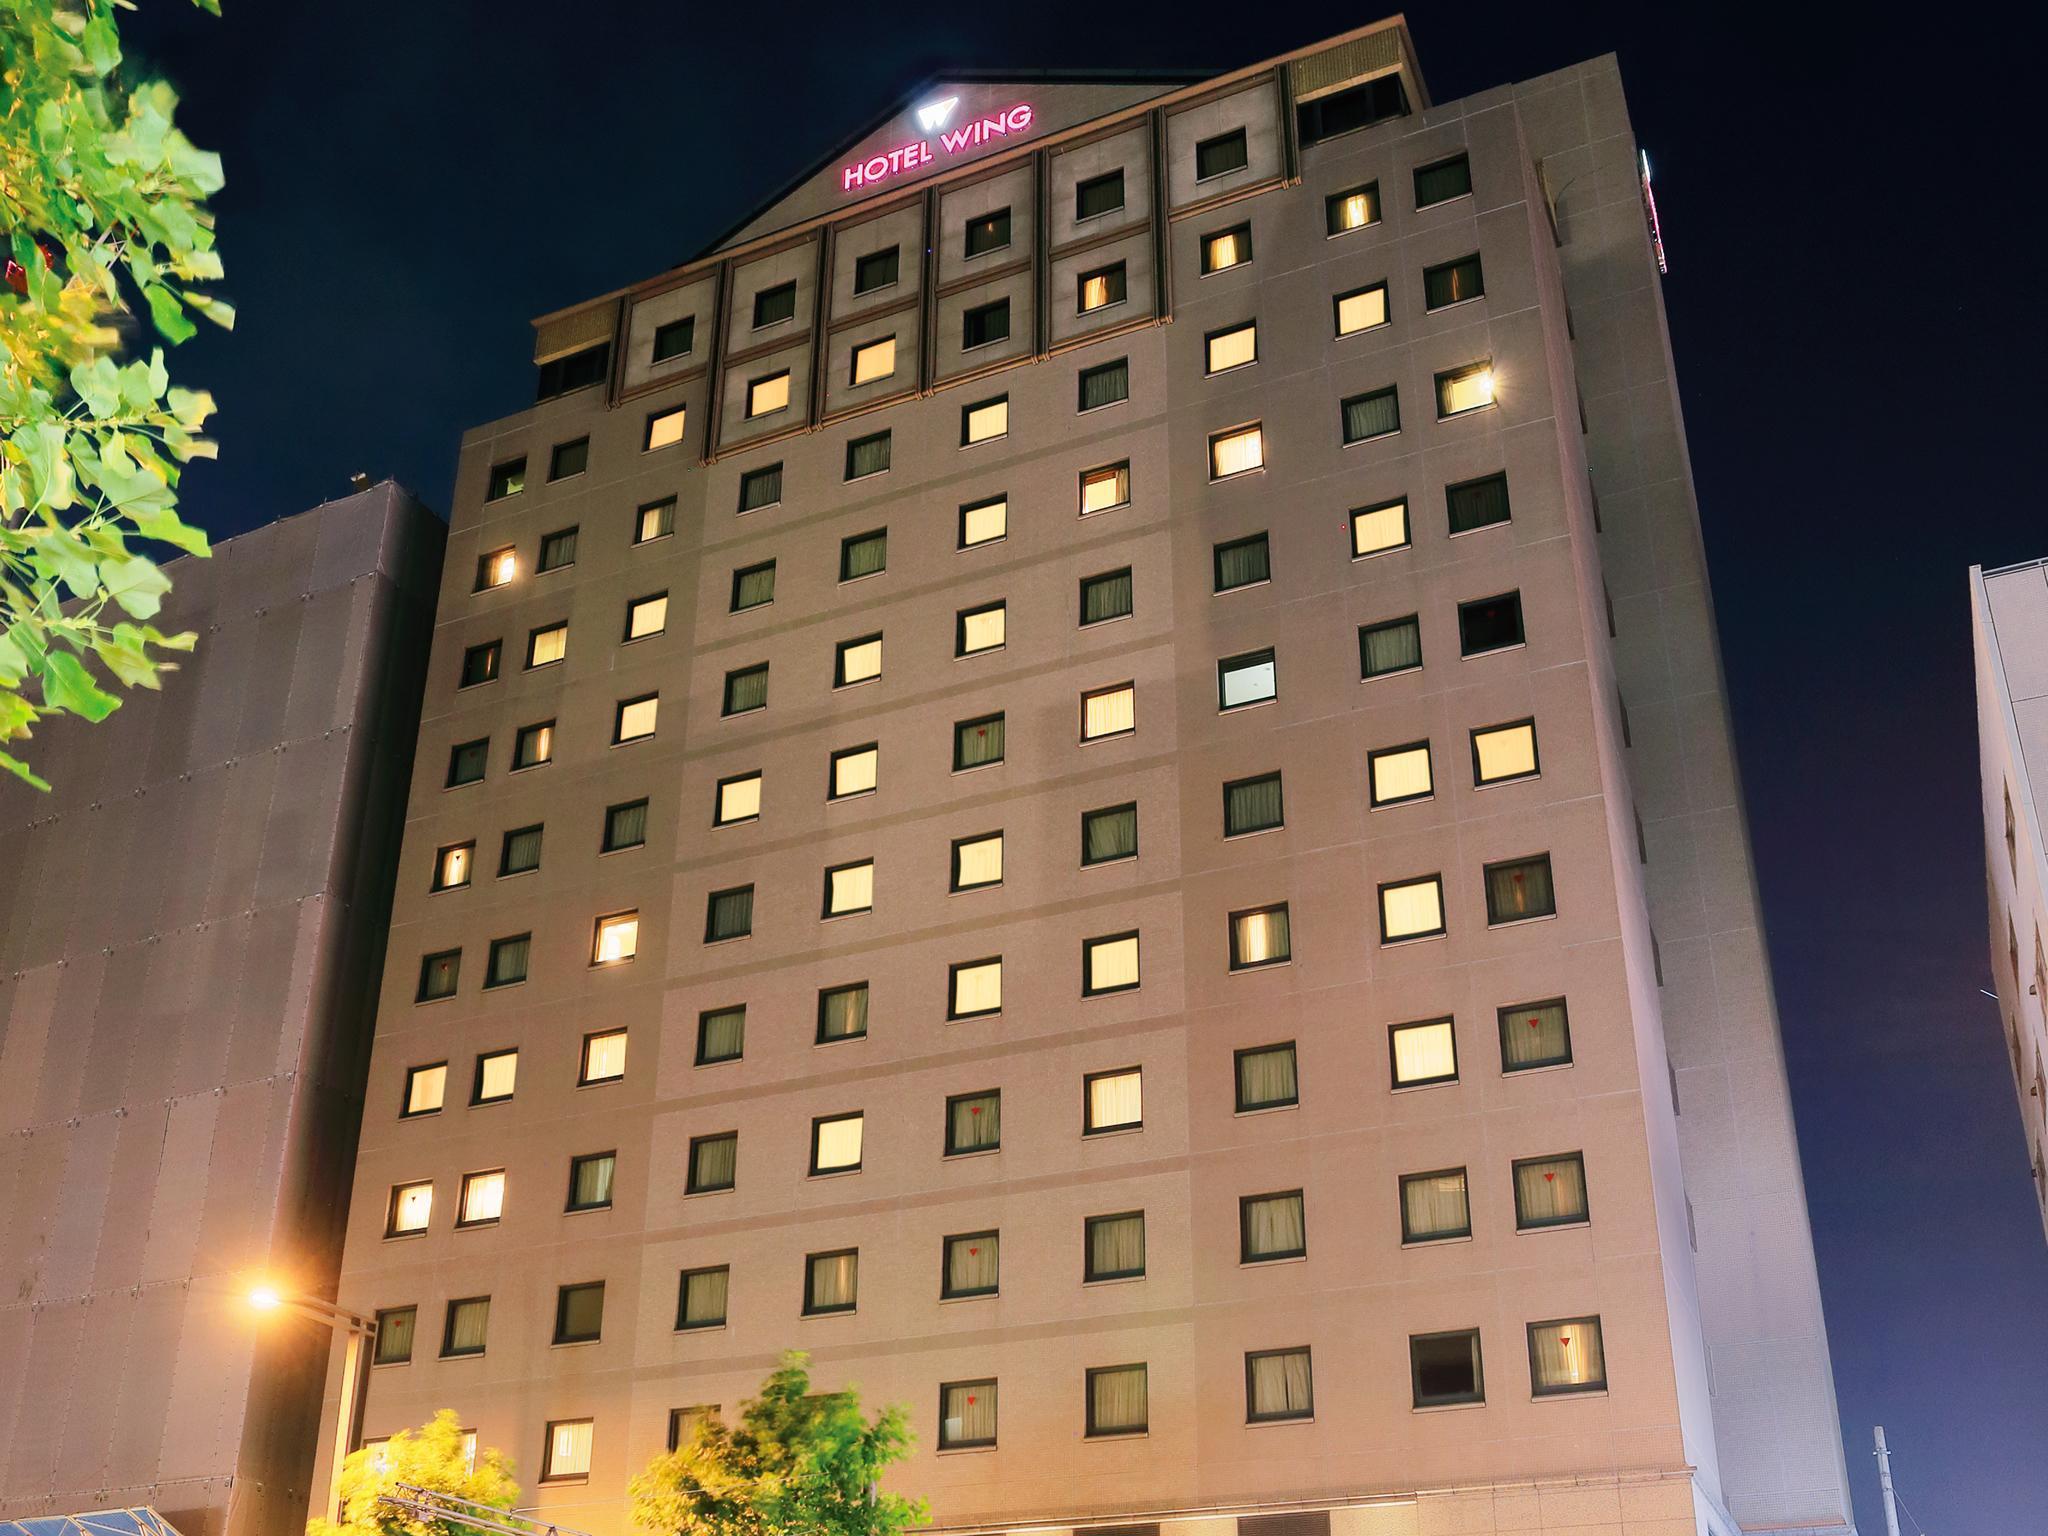 WING國際酒店 - 東京四谷 Hotel Wing International Premium Tokyo Yotsuya